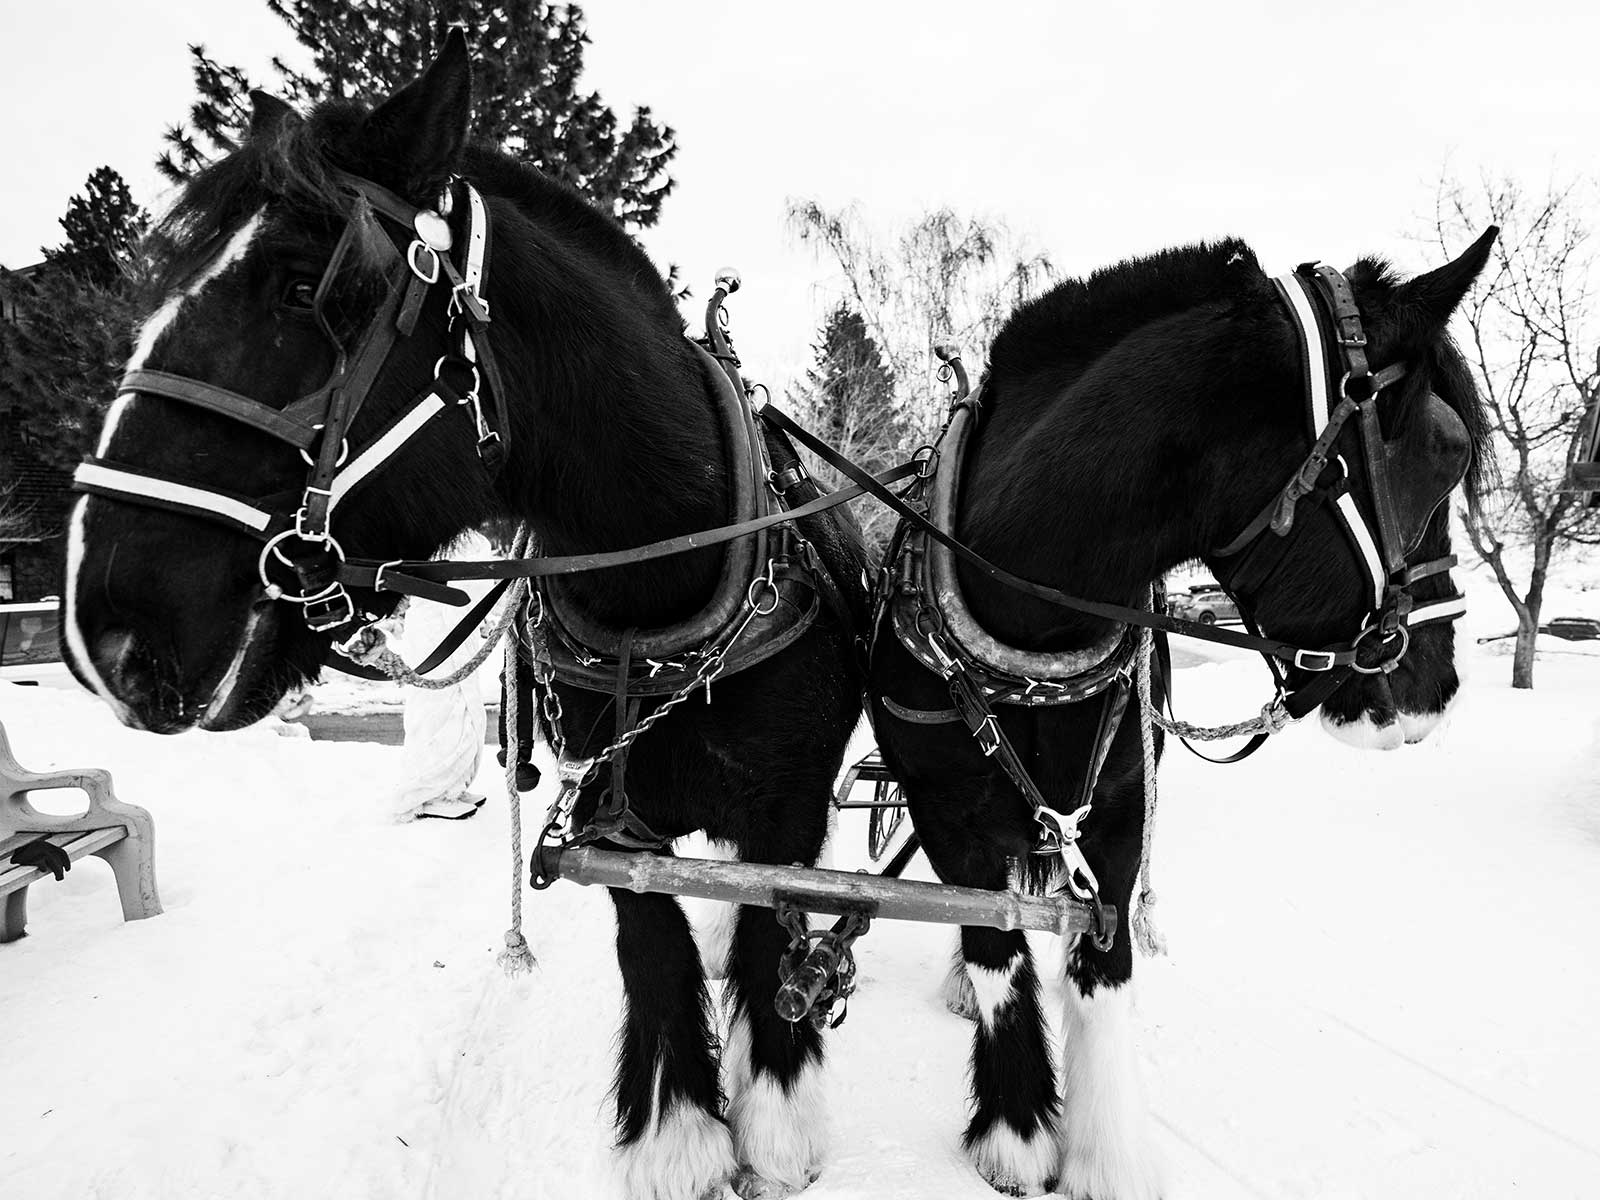 Sleigh ride horses